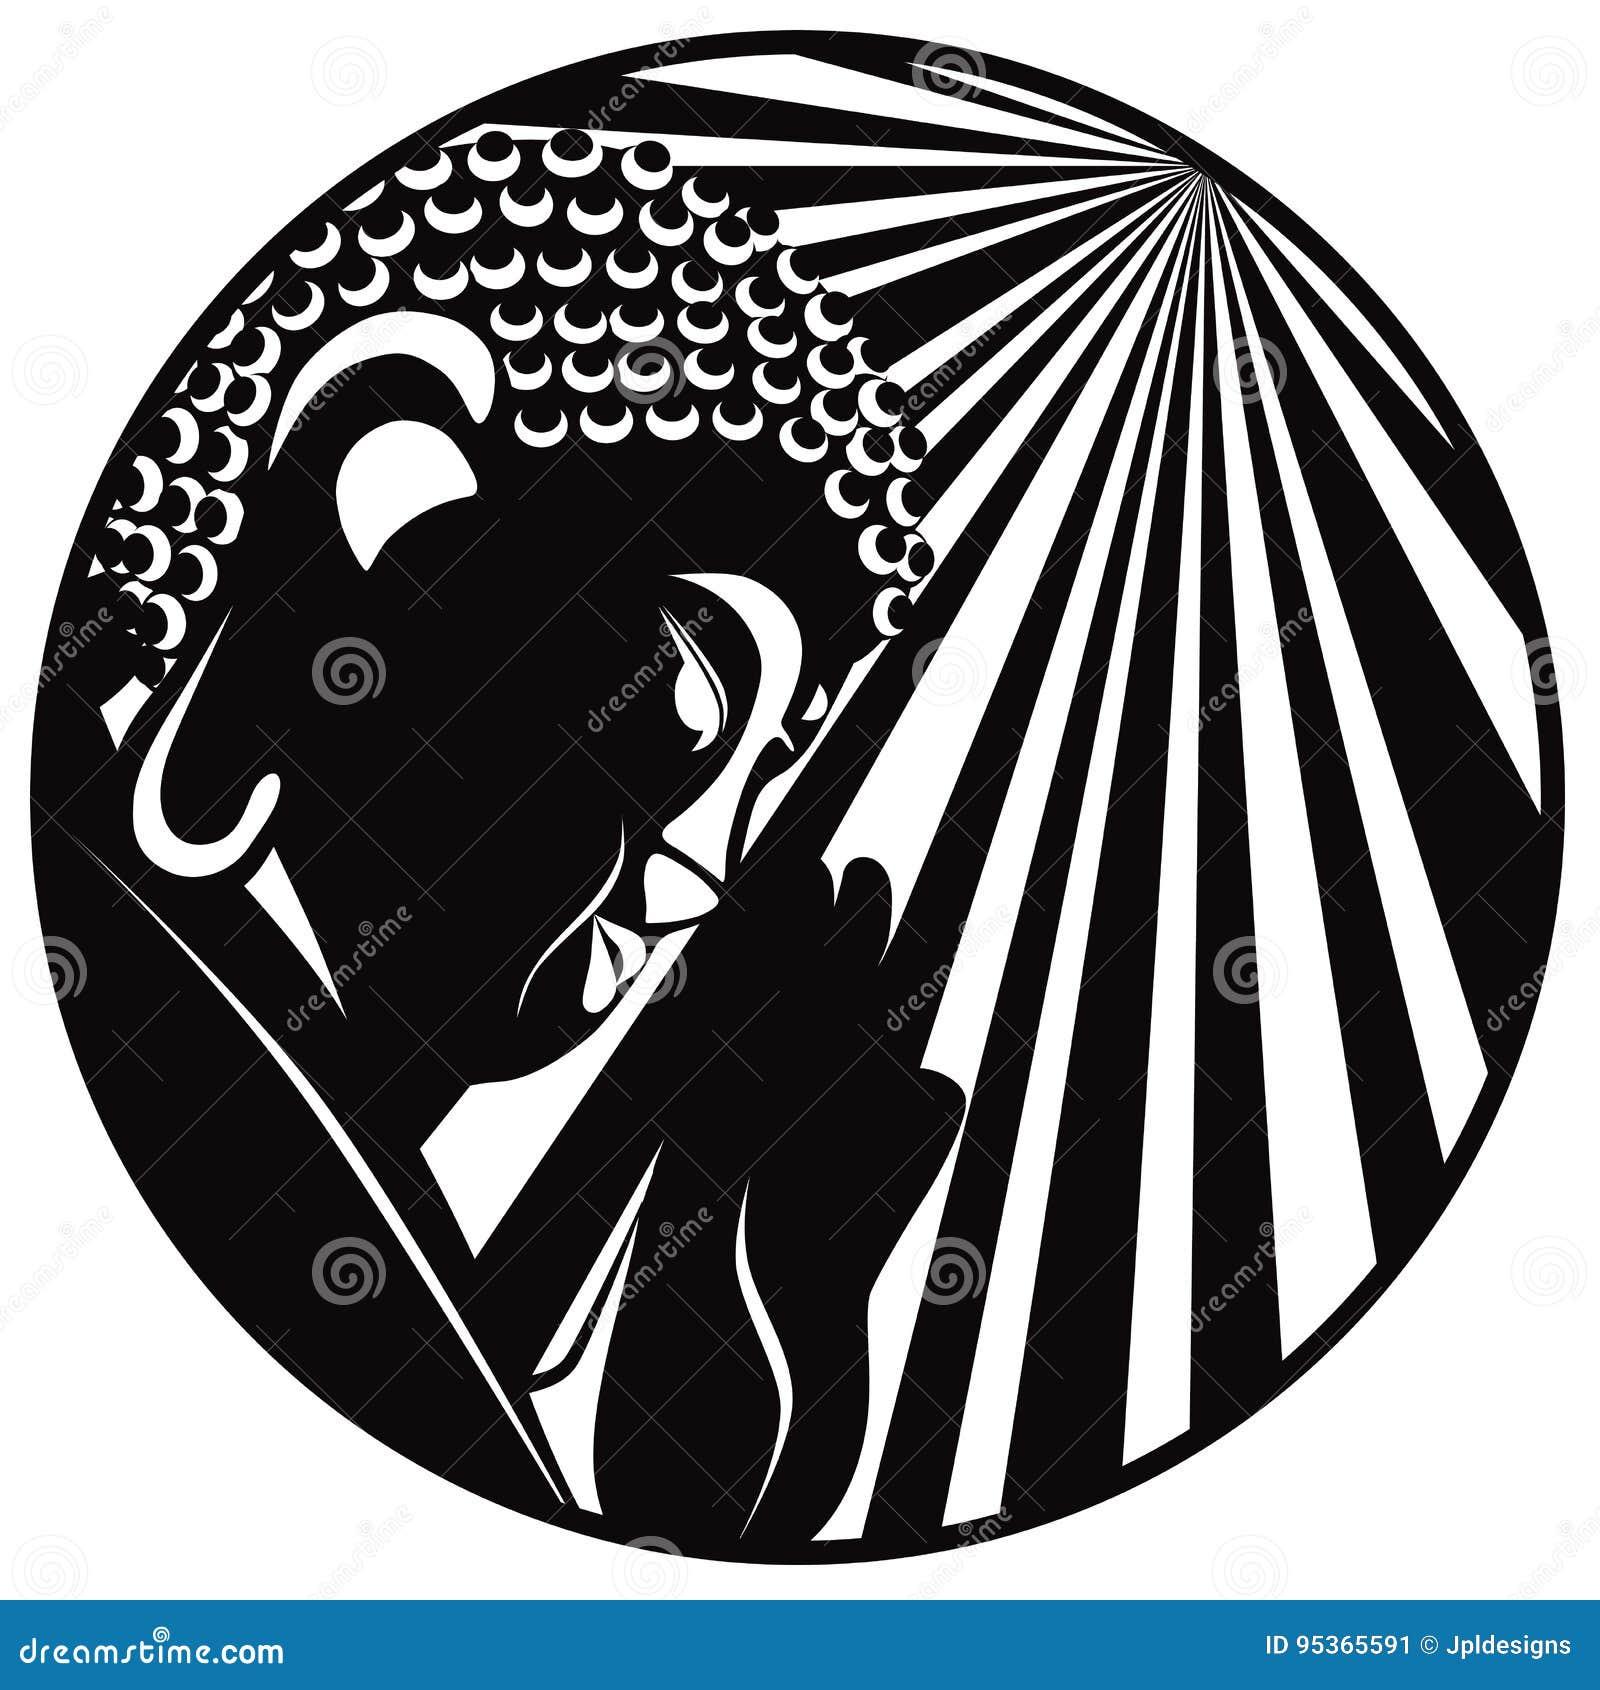 Buddha raised hand with light rays circle black and white vector buddha raised hand with light rays circle black and white vector biocorpaavc Choice Image